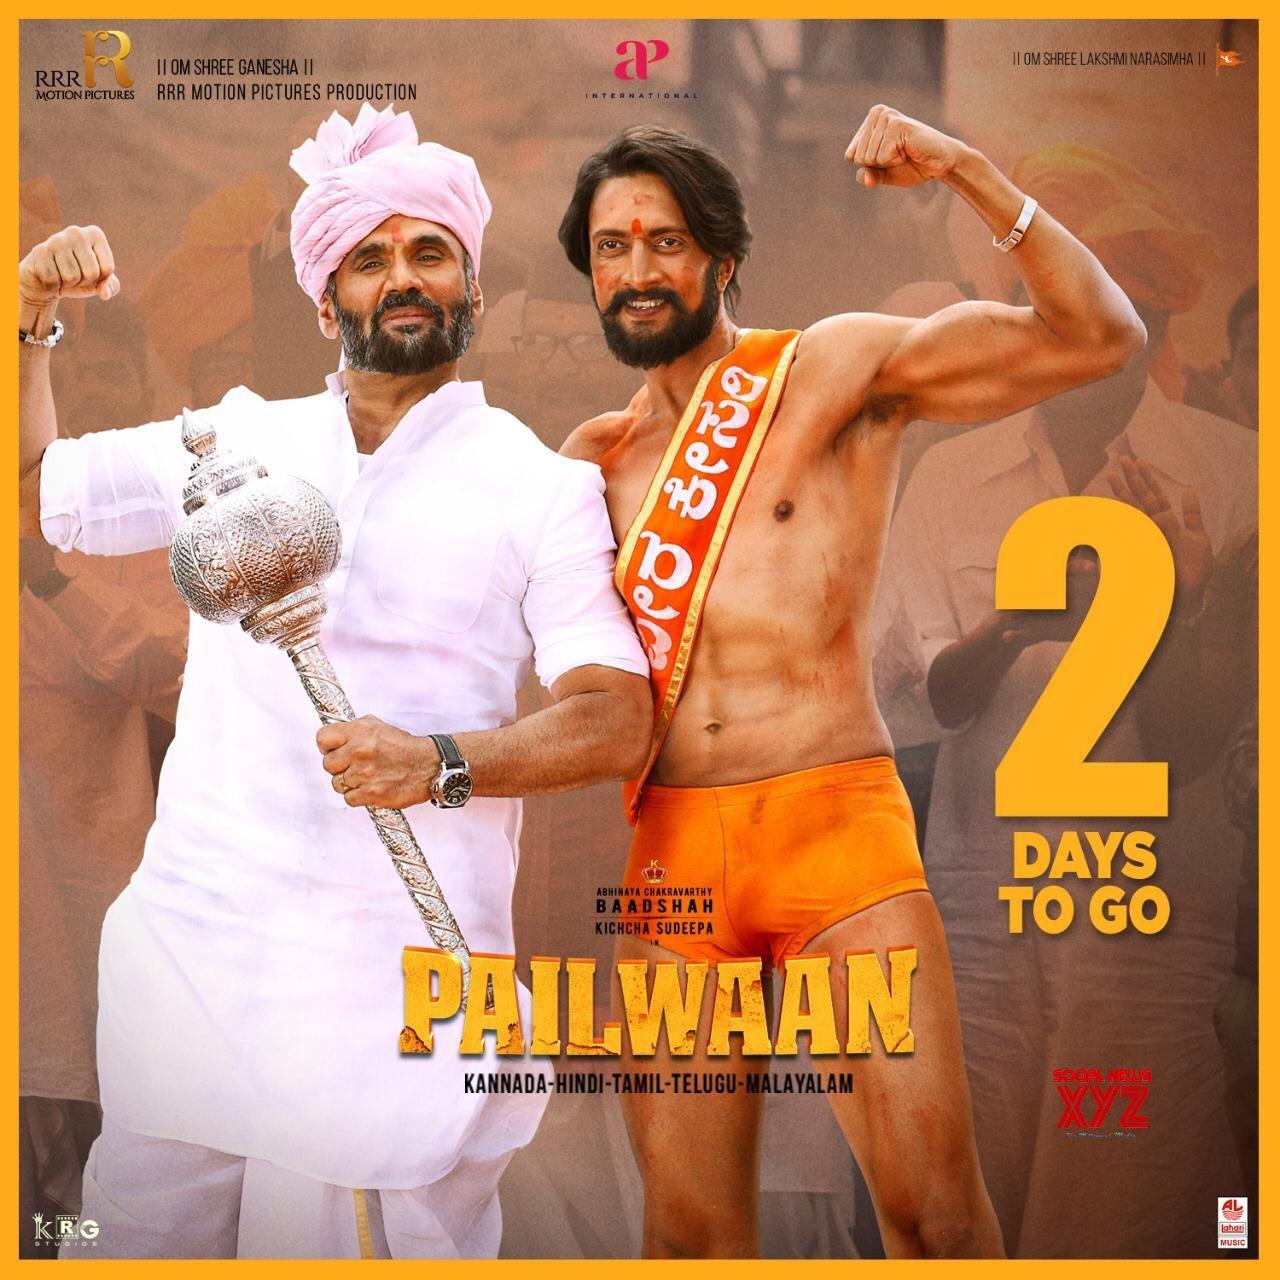 Kichcha Sudeep's Pailwaan Movie 2 Days To Go Poster